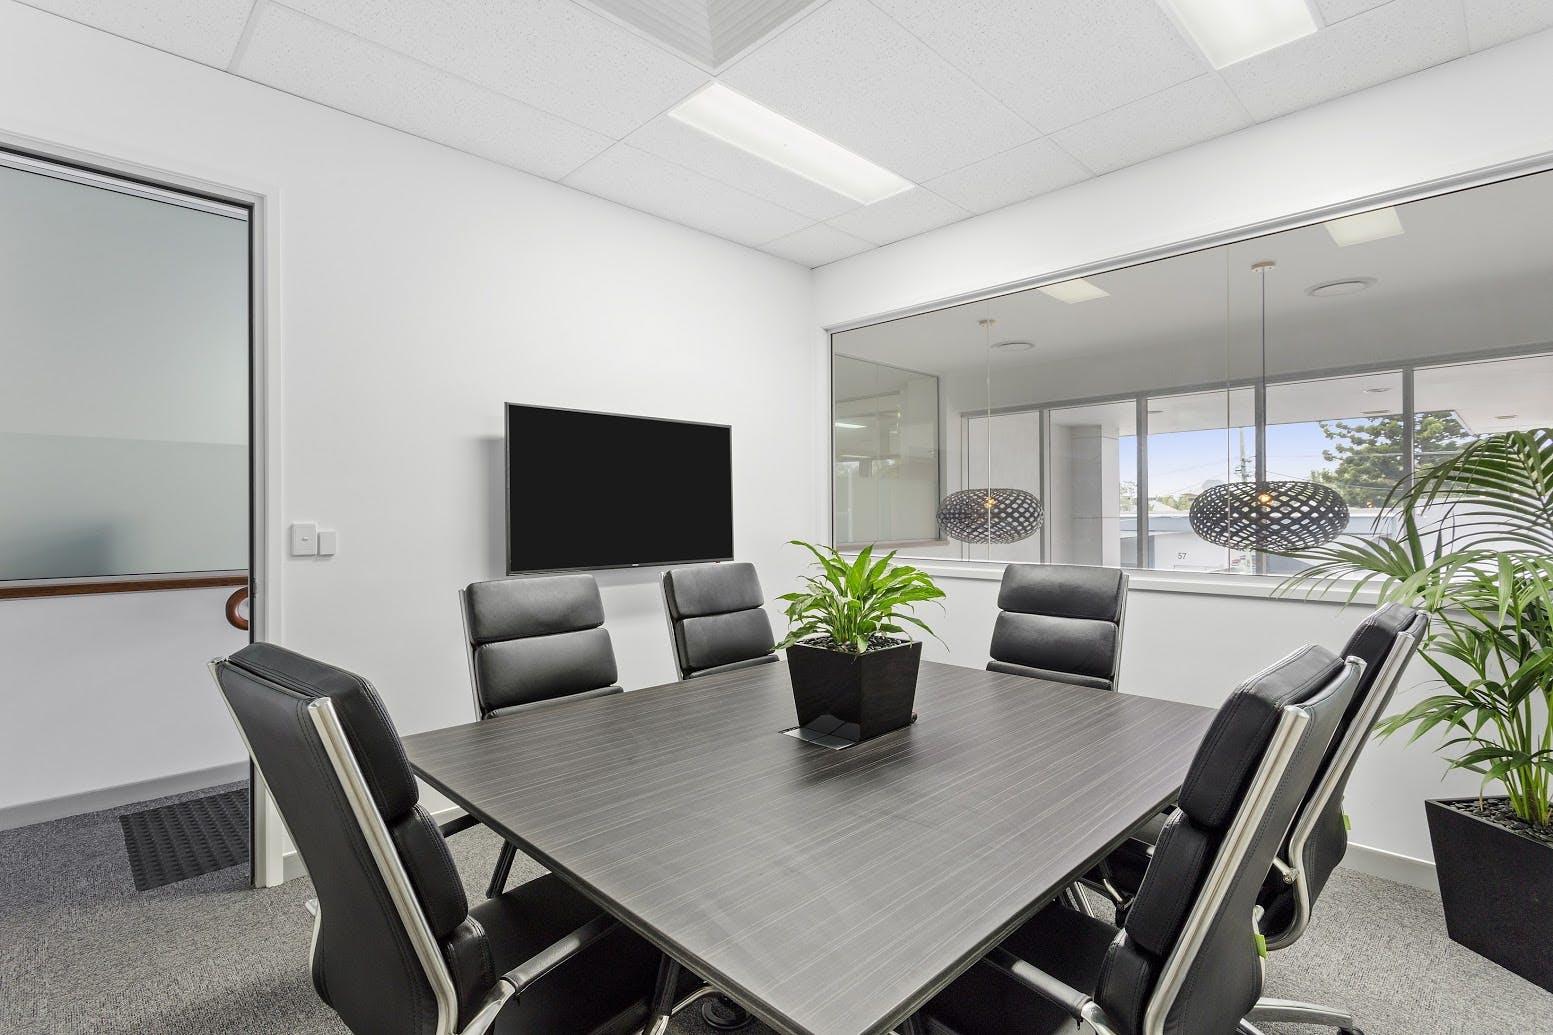 Laidlaw Boardroom for 8 people, meeting room at Studio42, image 2